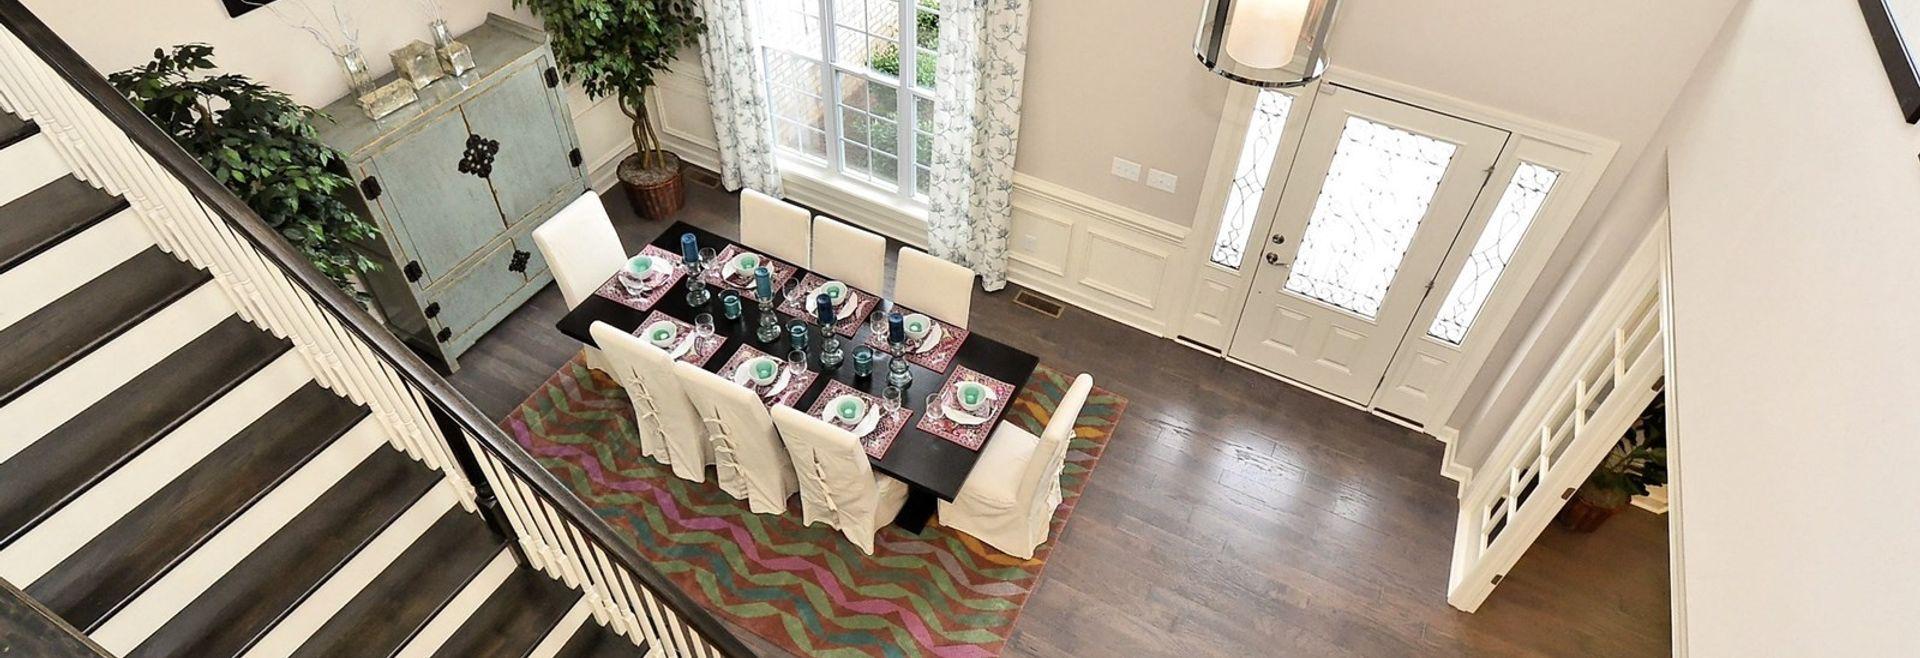 Silverado Plan Formal Room & Foyer